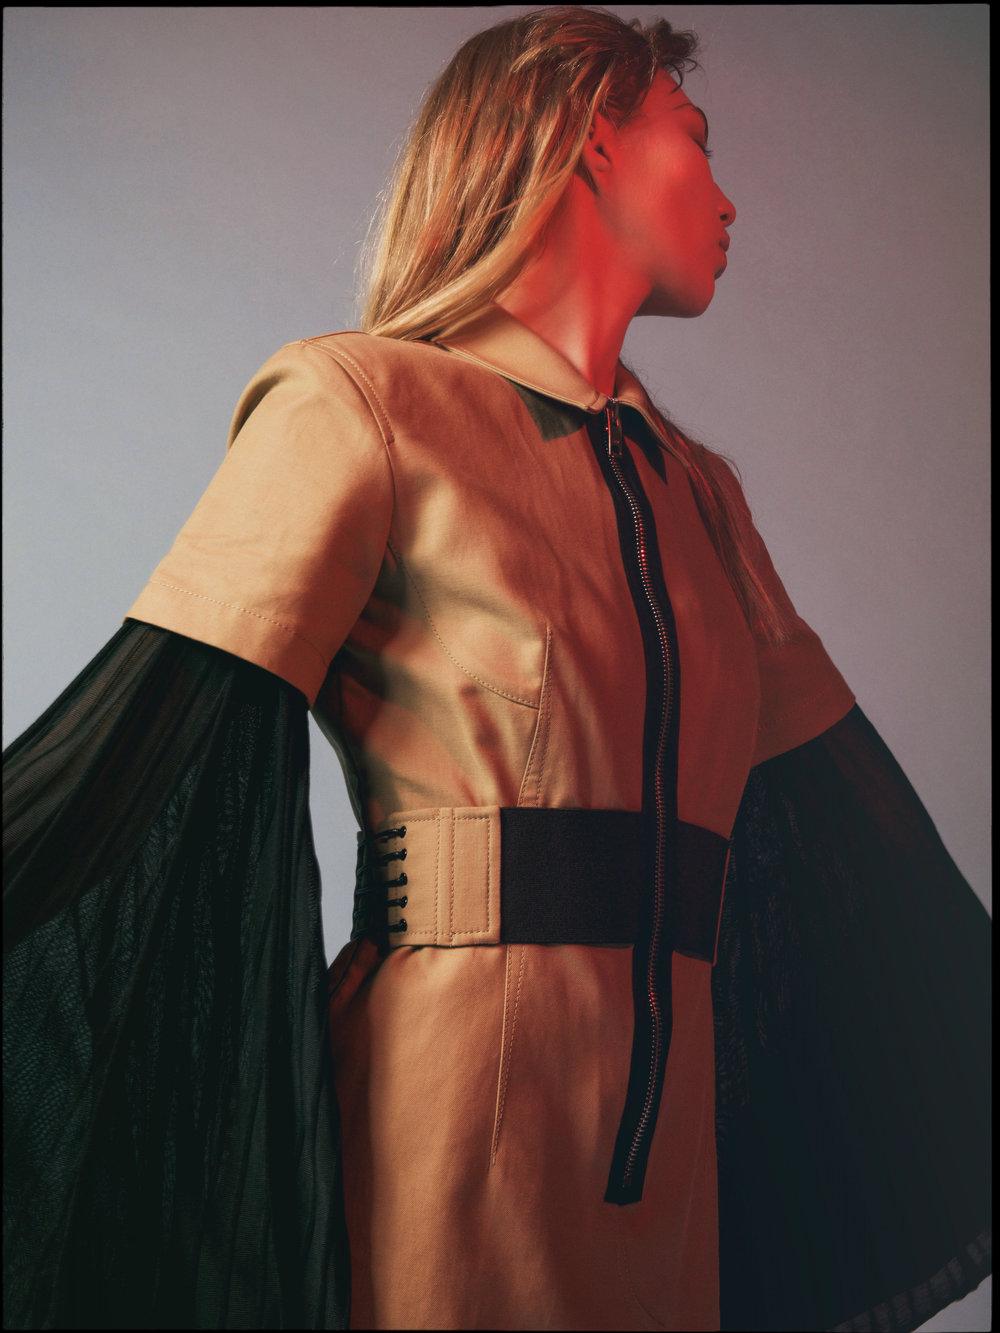 khaki top ALEXANDER WANG available at  Saks Fifth Avenue , black top CHLOE available at  Holt Renfrew ,